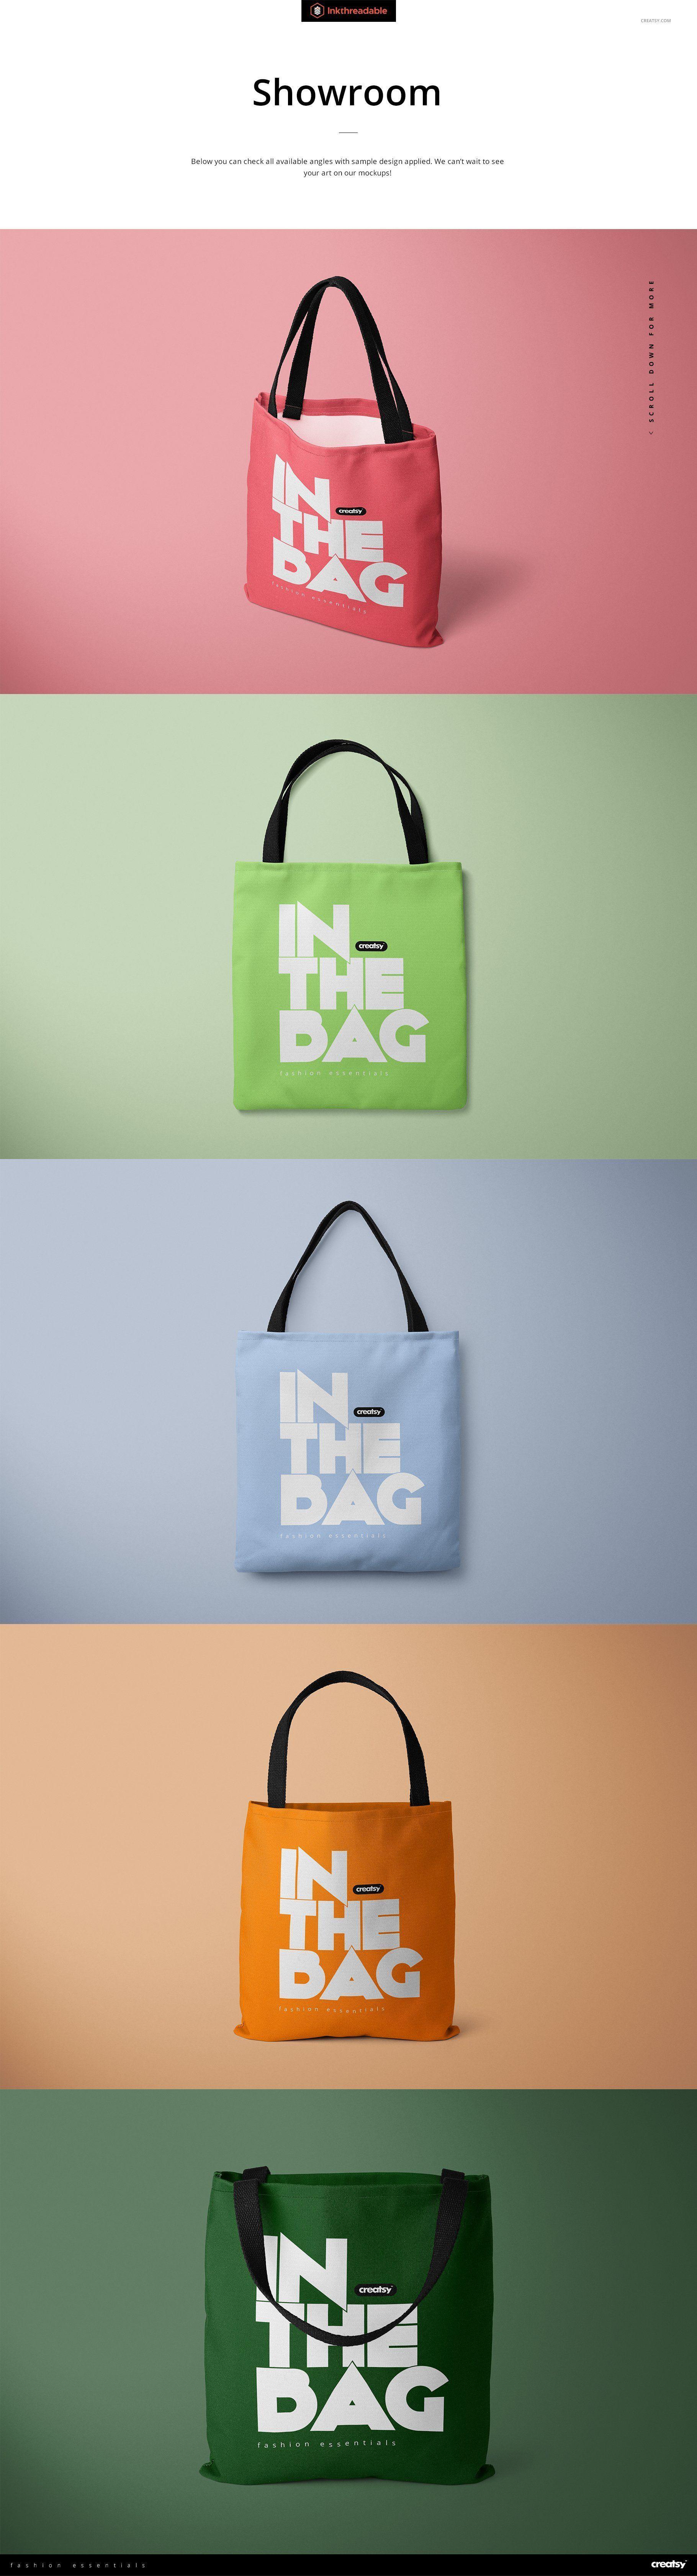 Download Polyester Tote Bag Mockup Set Ad Sponsored Files Psd File Specs Bag Fi Polyester Tote Bag Mockup Set Ad Sponsored In 2020 Bags Bag Mockup Tote Bag